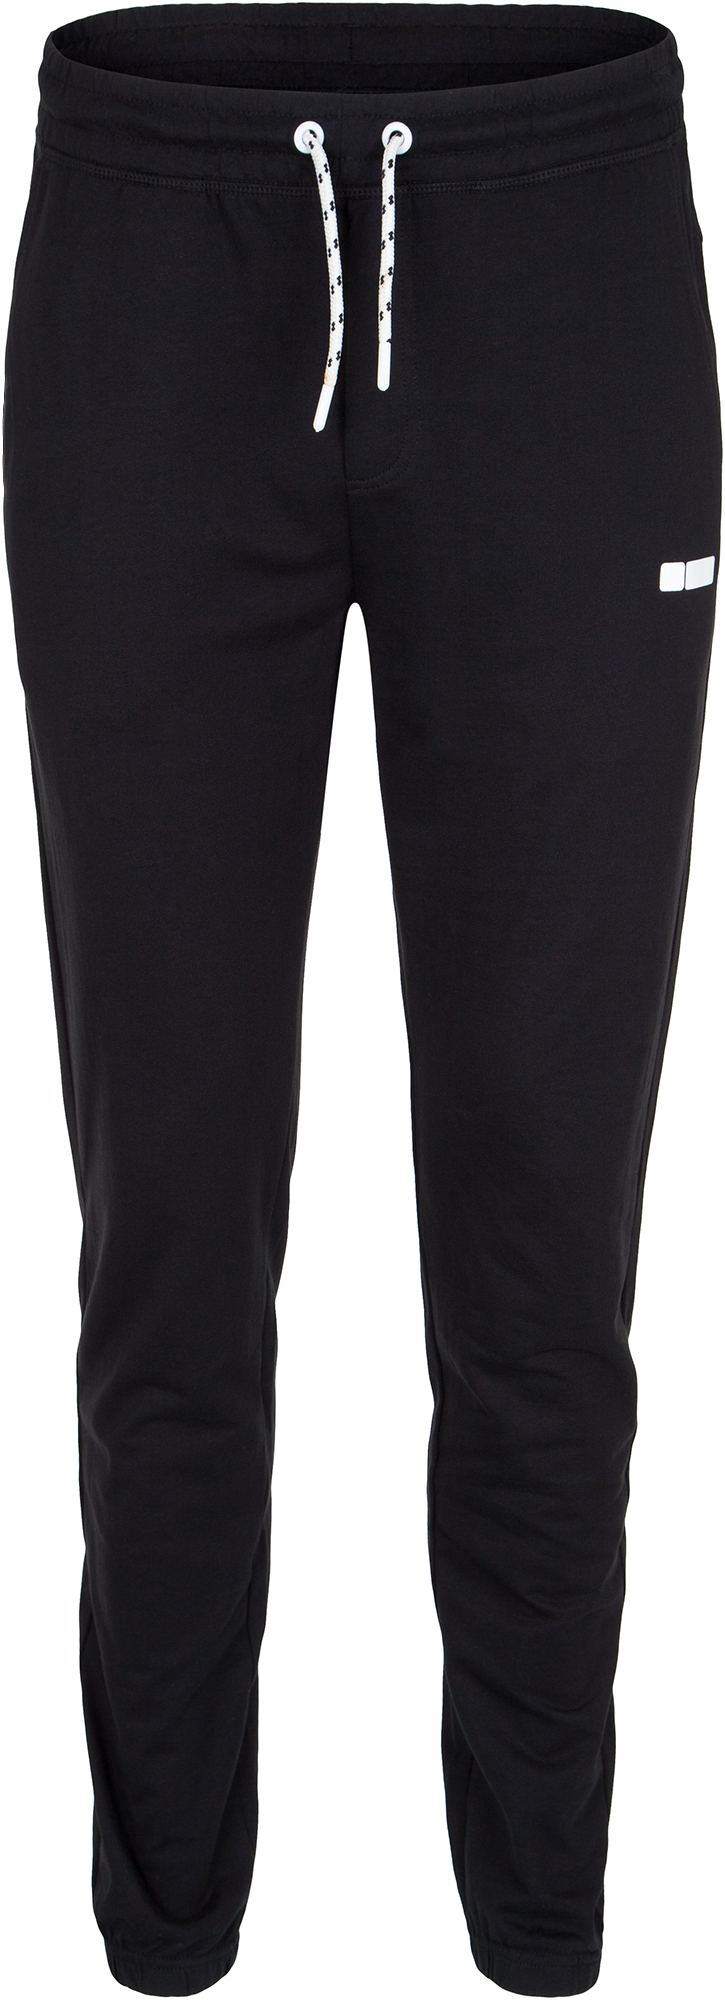 Freddy Брюки мужские Freddy Basic Cotton, размер 54-56 недорго, оригинальная цена